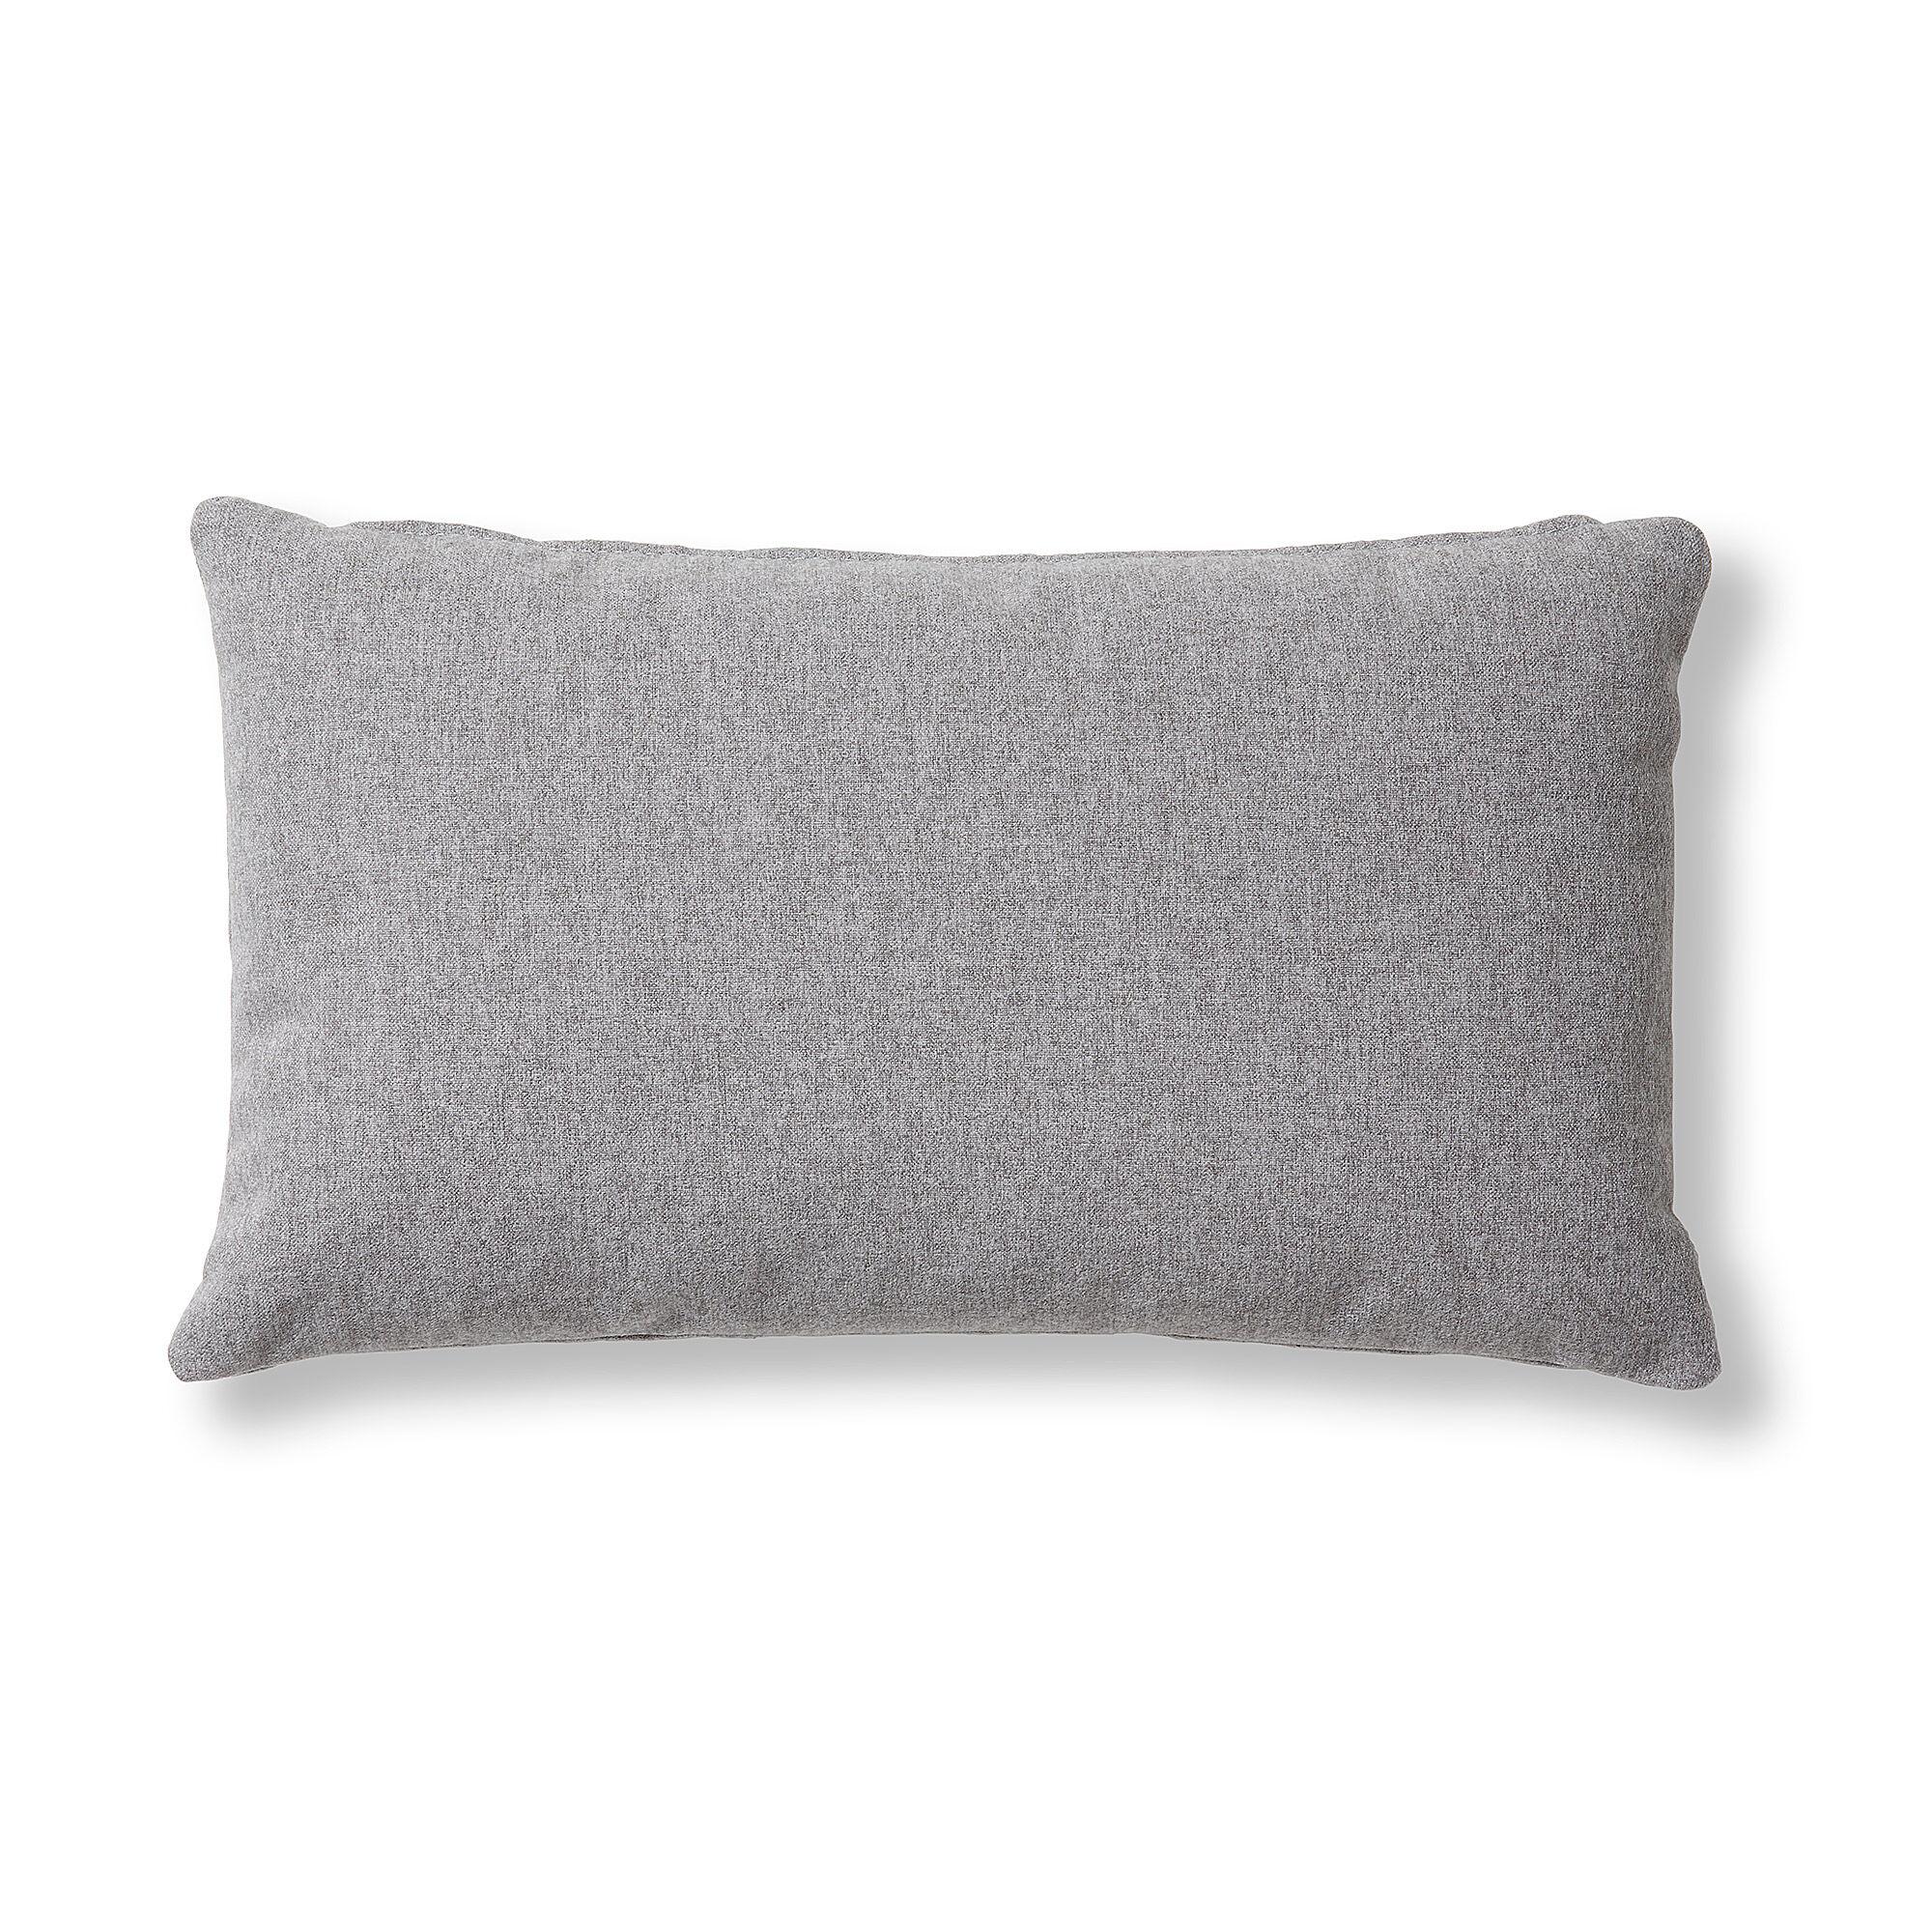 Kave Home Fodera per cuscino Kam 30 x 50 cm grigio